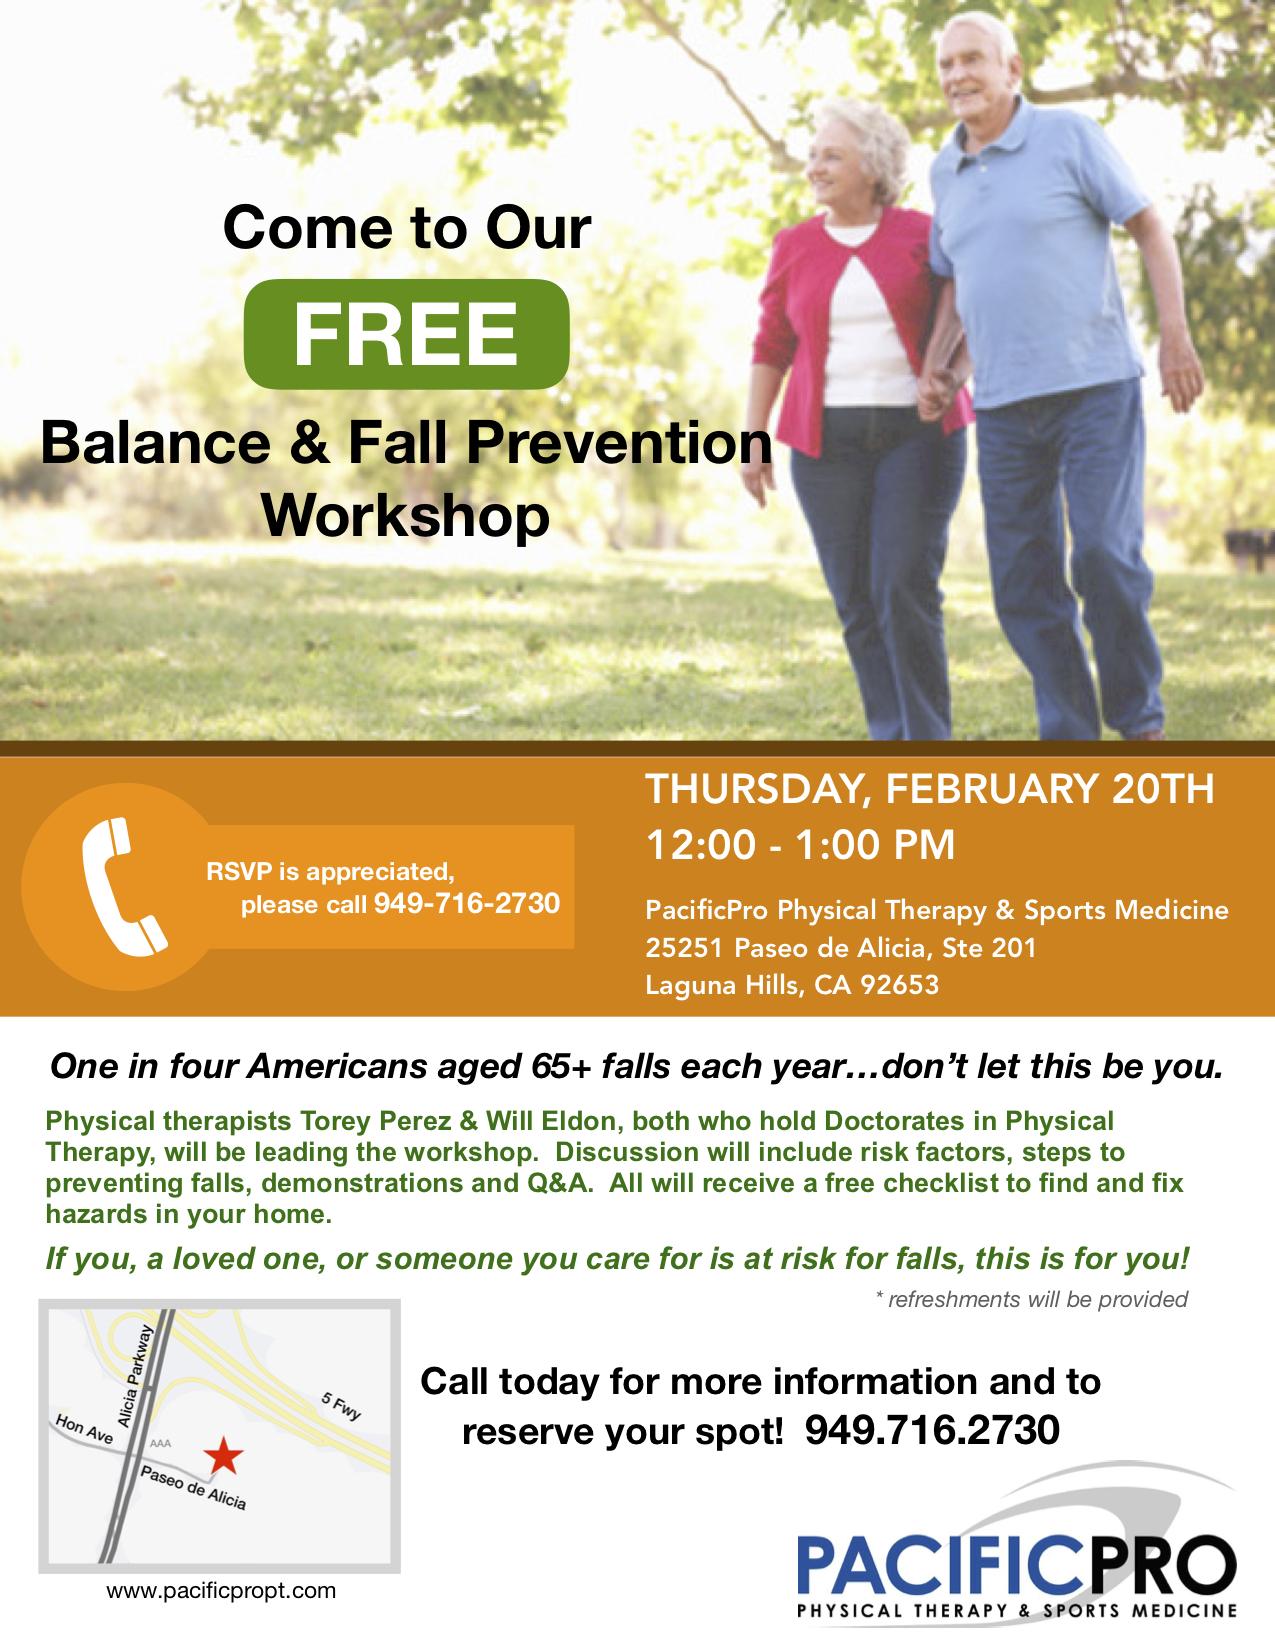 Balance & Fall Prevention Workshop Flyer